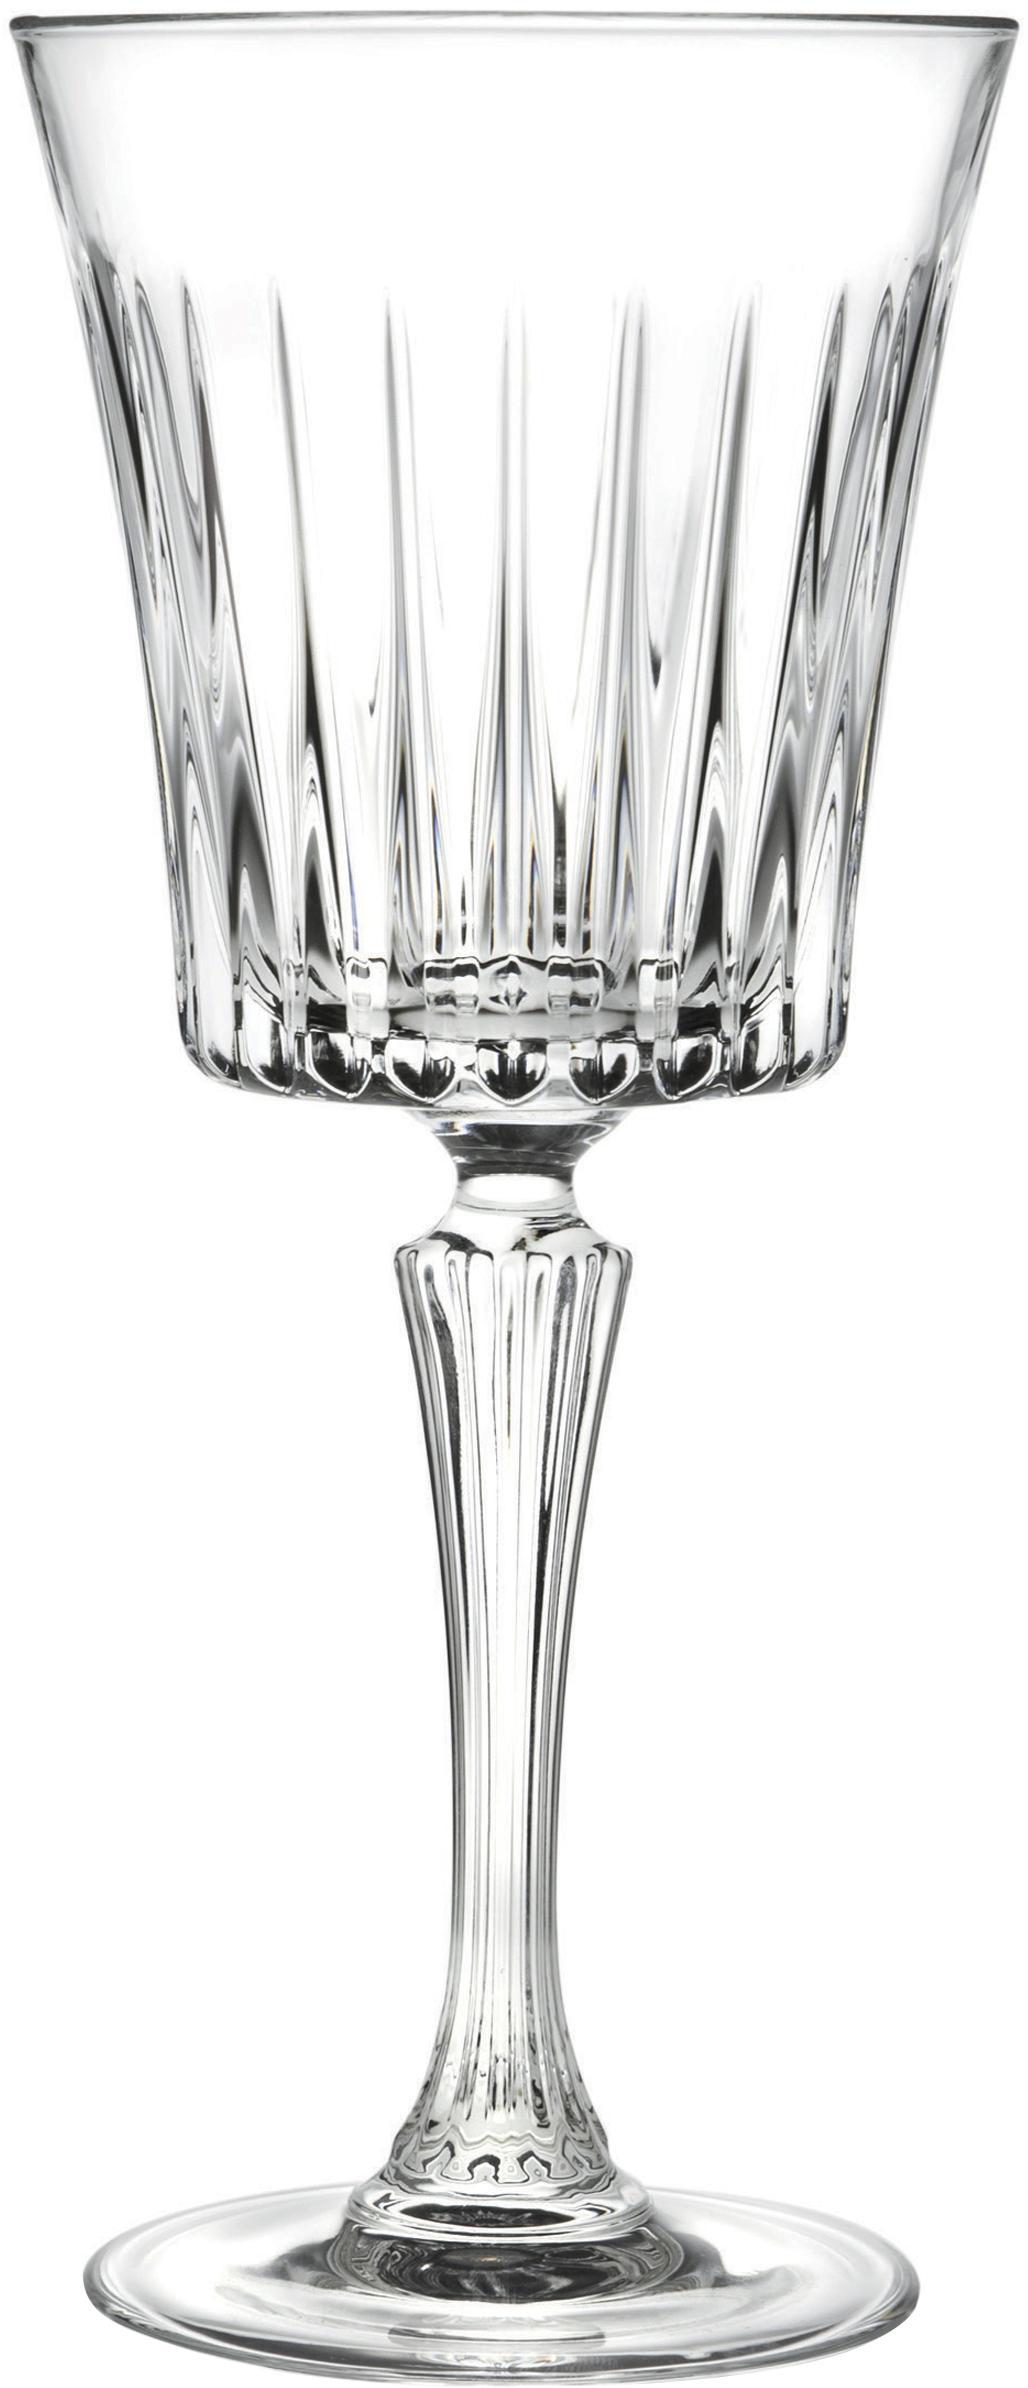 Kristall-Weißweingläser Timeless mit Rillenrelief, 6er-Set, Kristallglas, Transparent, Ø 8 x H 20 cm